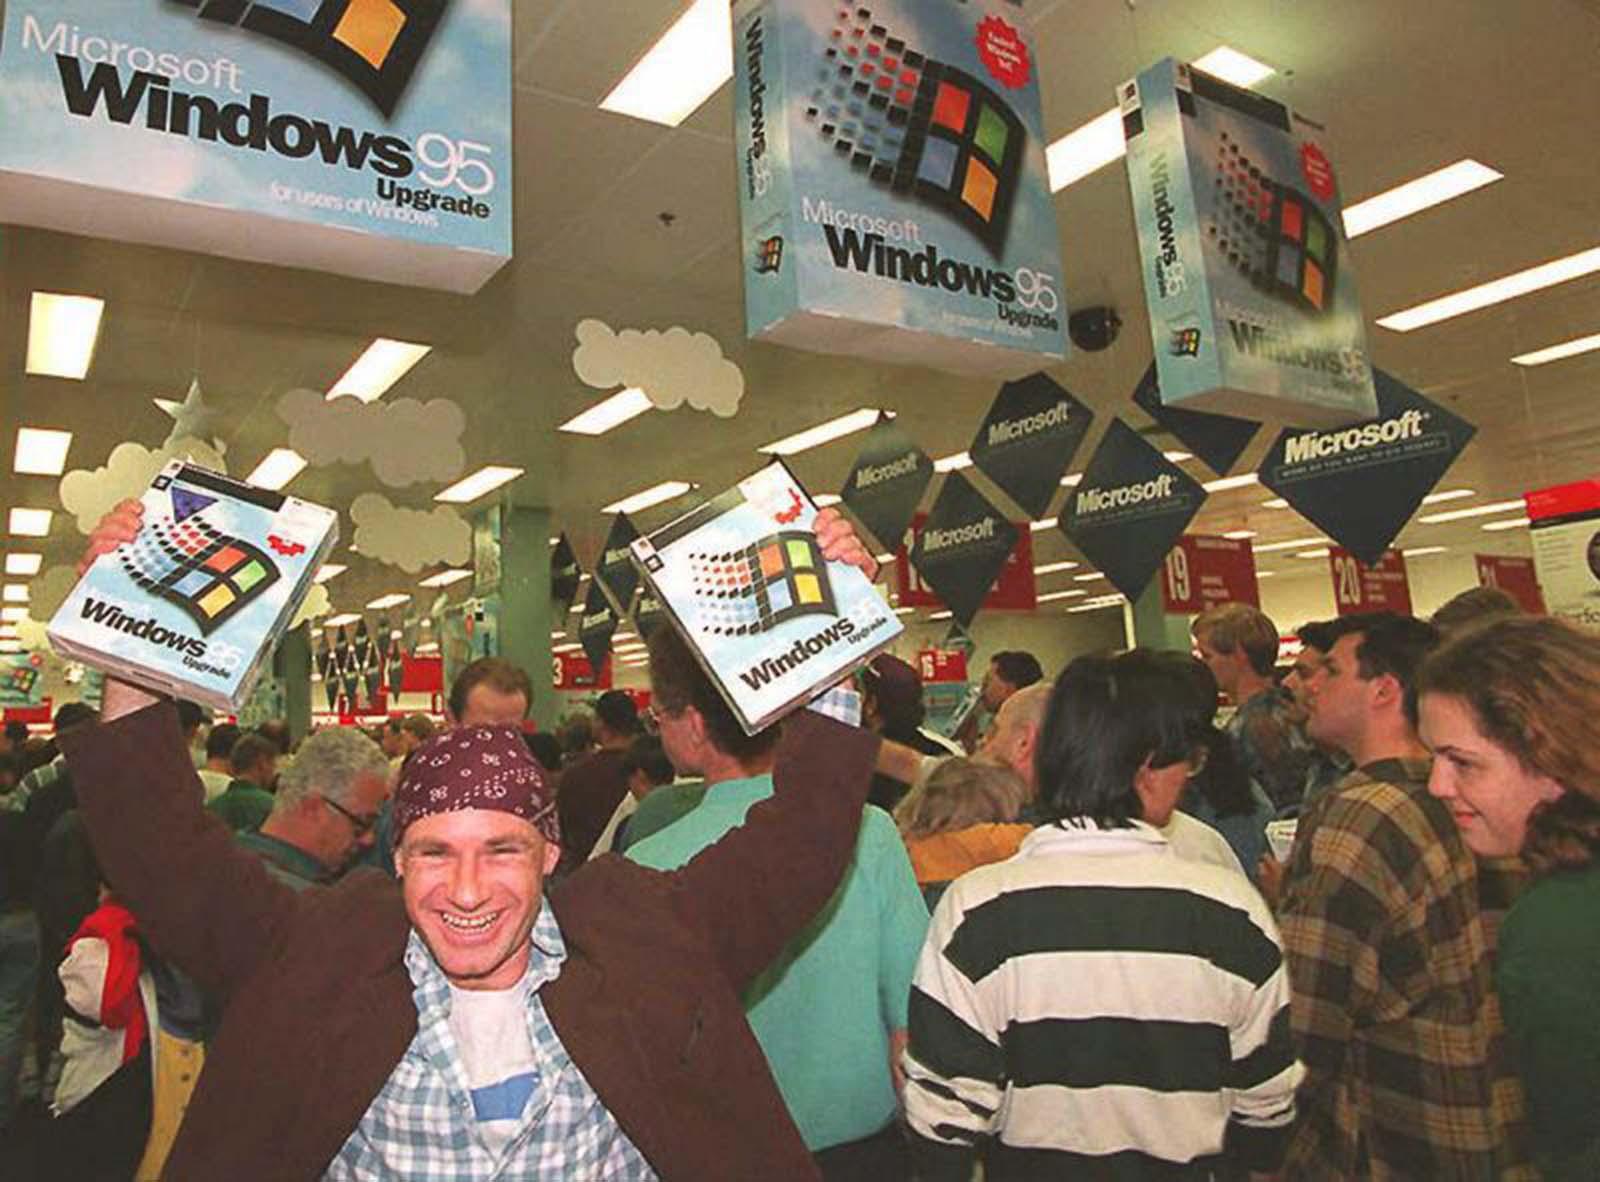 Windows_95_launch (1).jpg